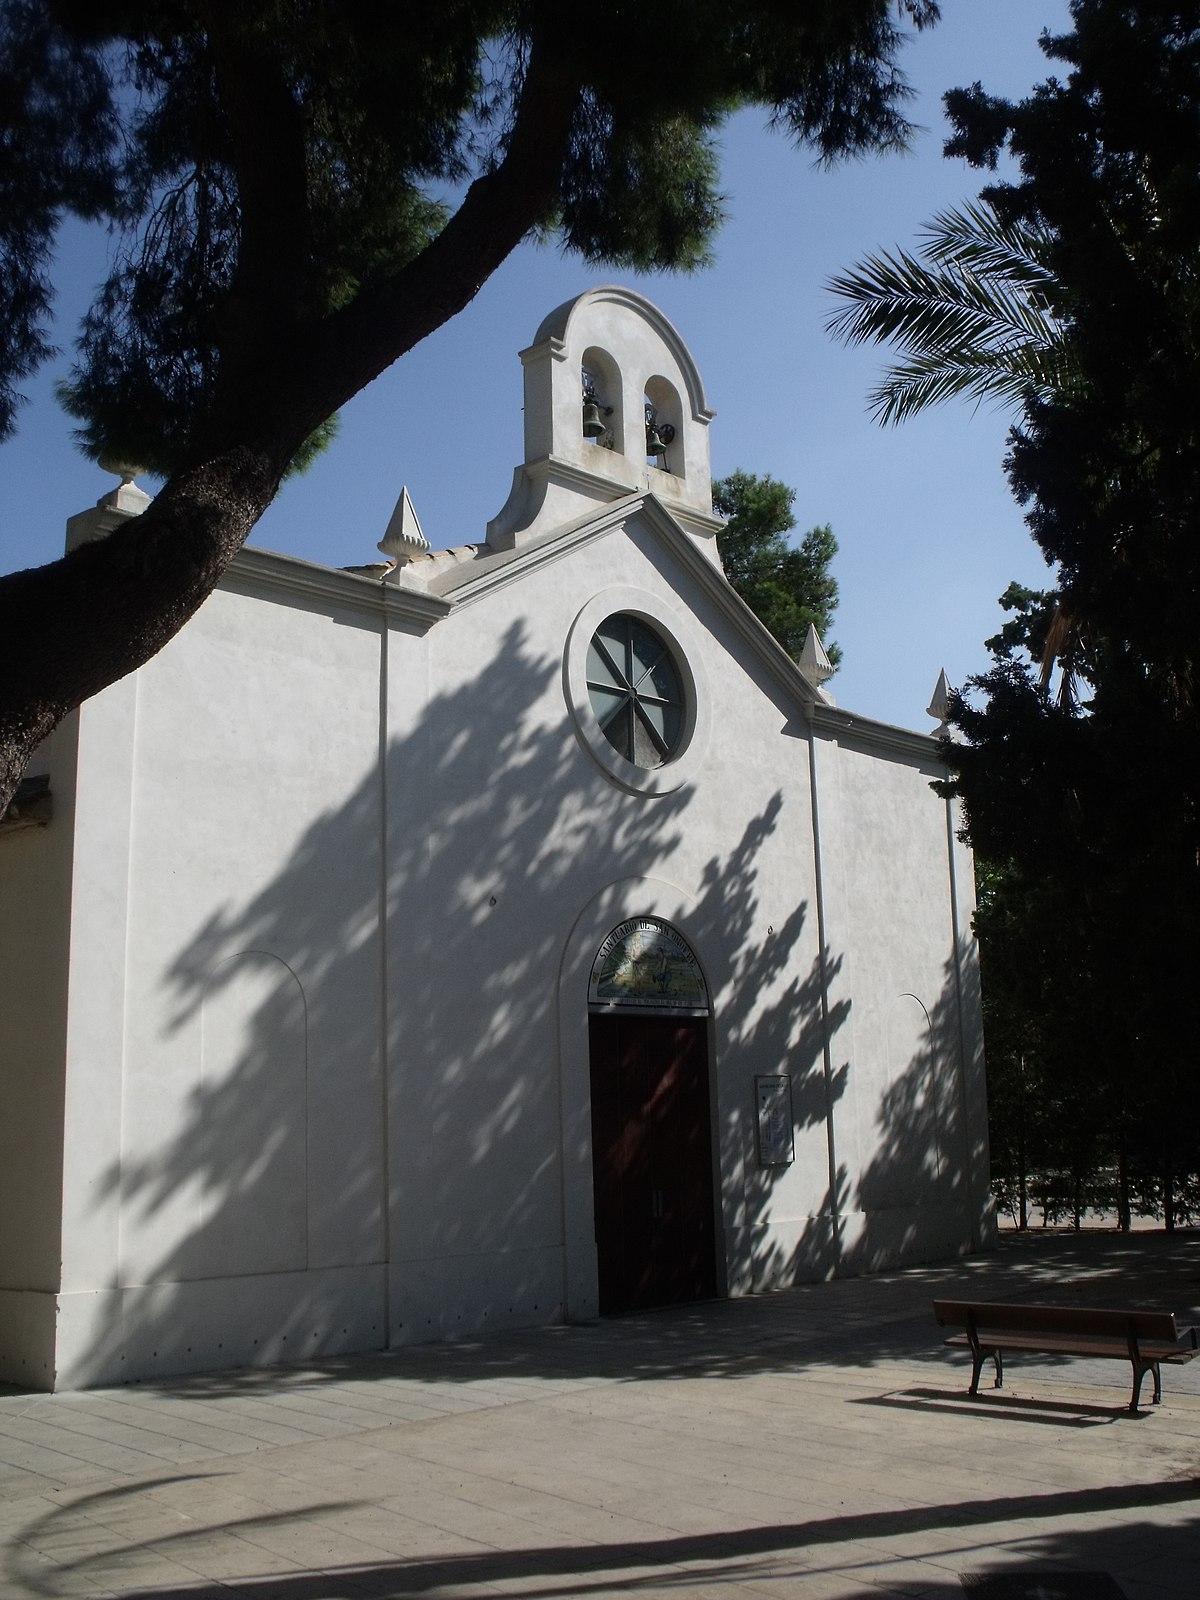 Santuari de sant onofre quart de poblet viquip dia l for Gimnasio quart de poblet